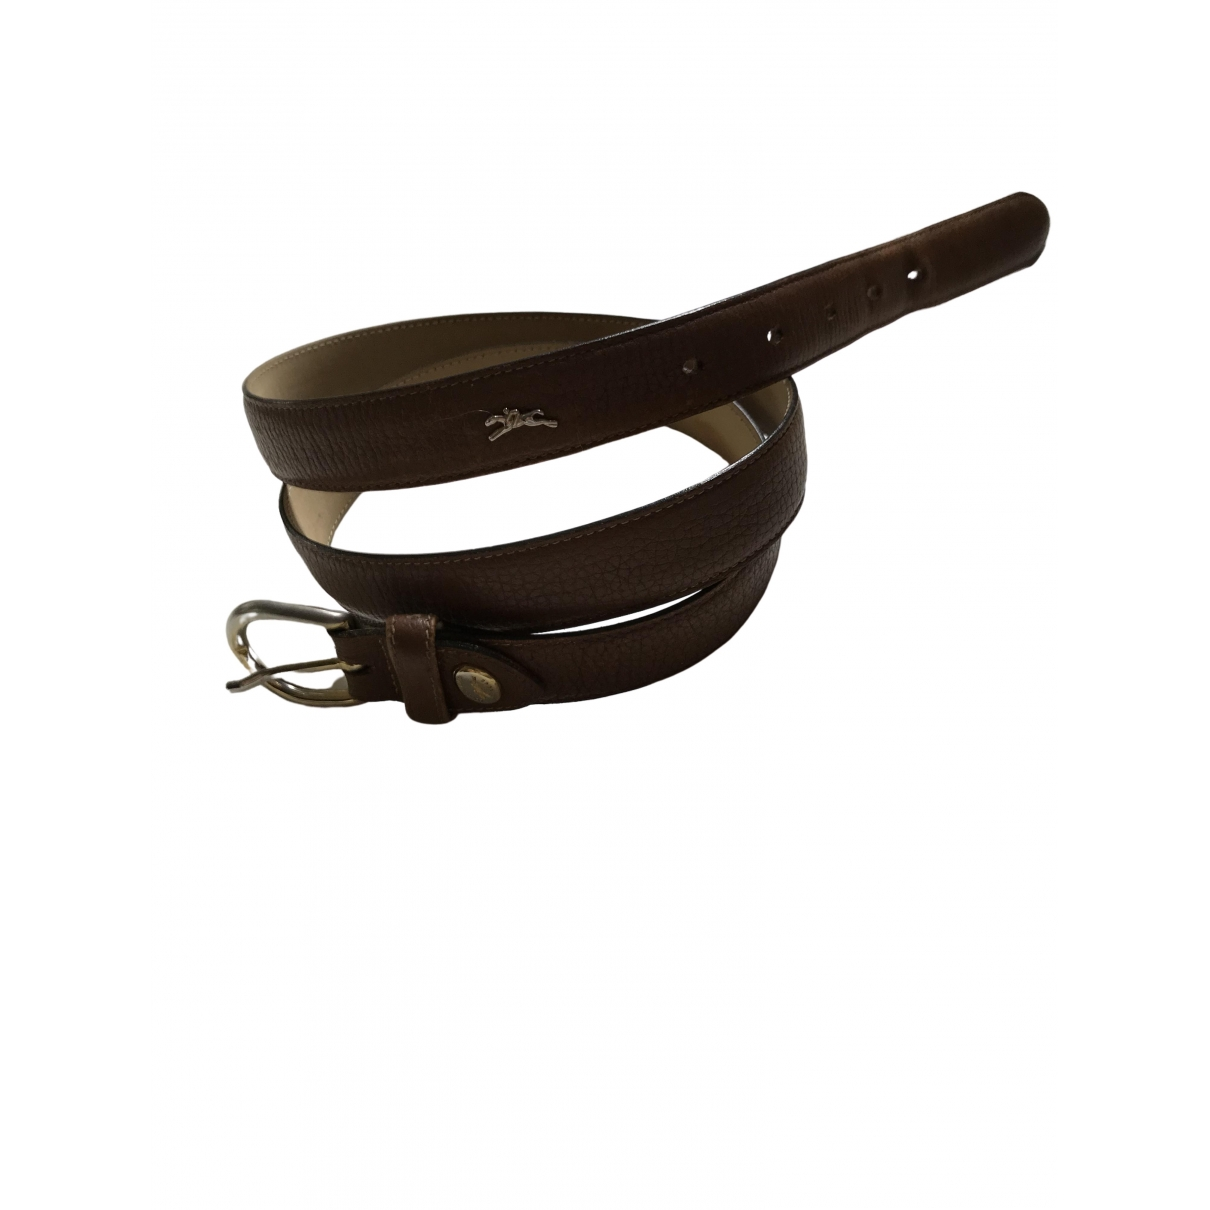 Longchamp \N Beige Leather belt for Women L International